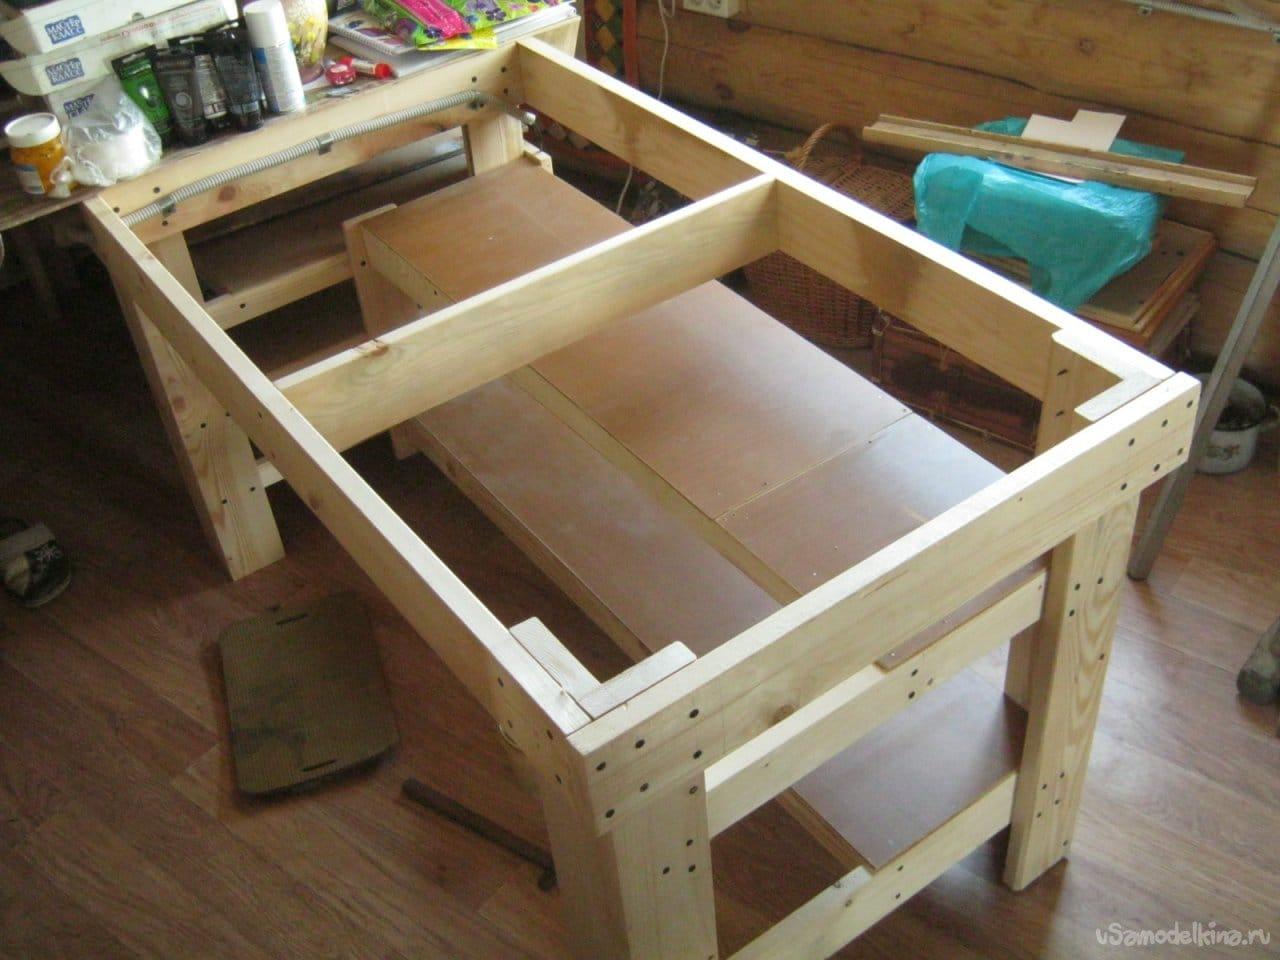 A simple utilitarian table for an artist's home studio